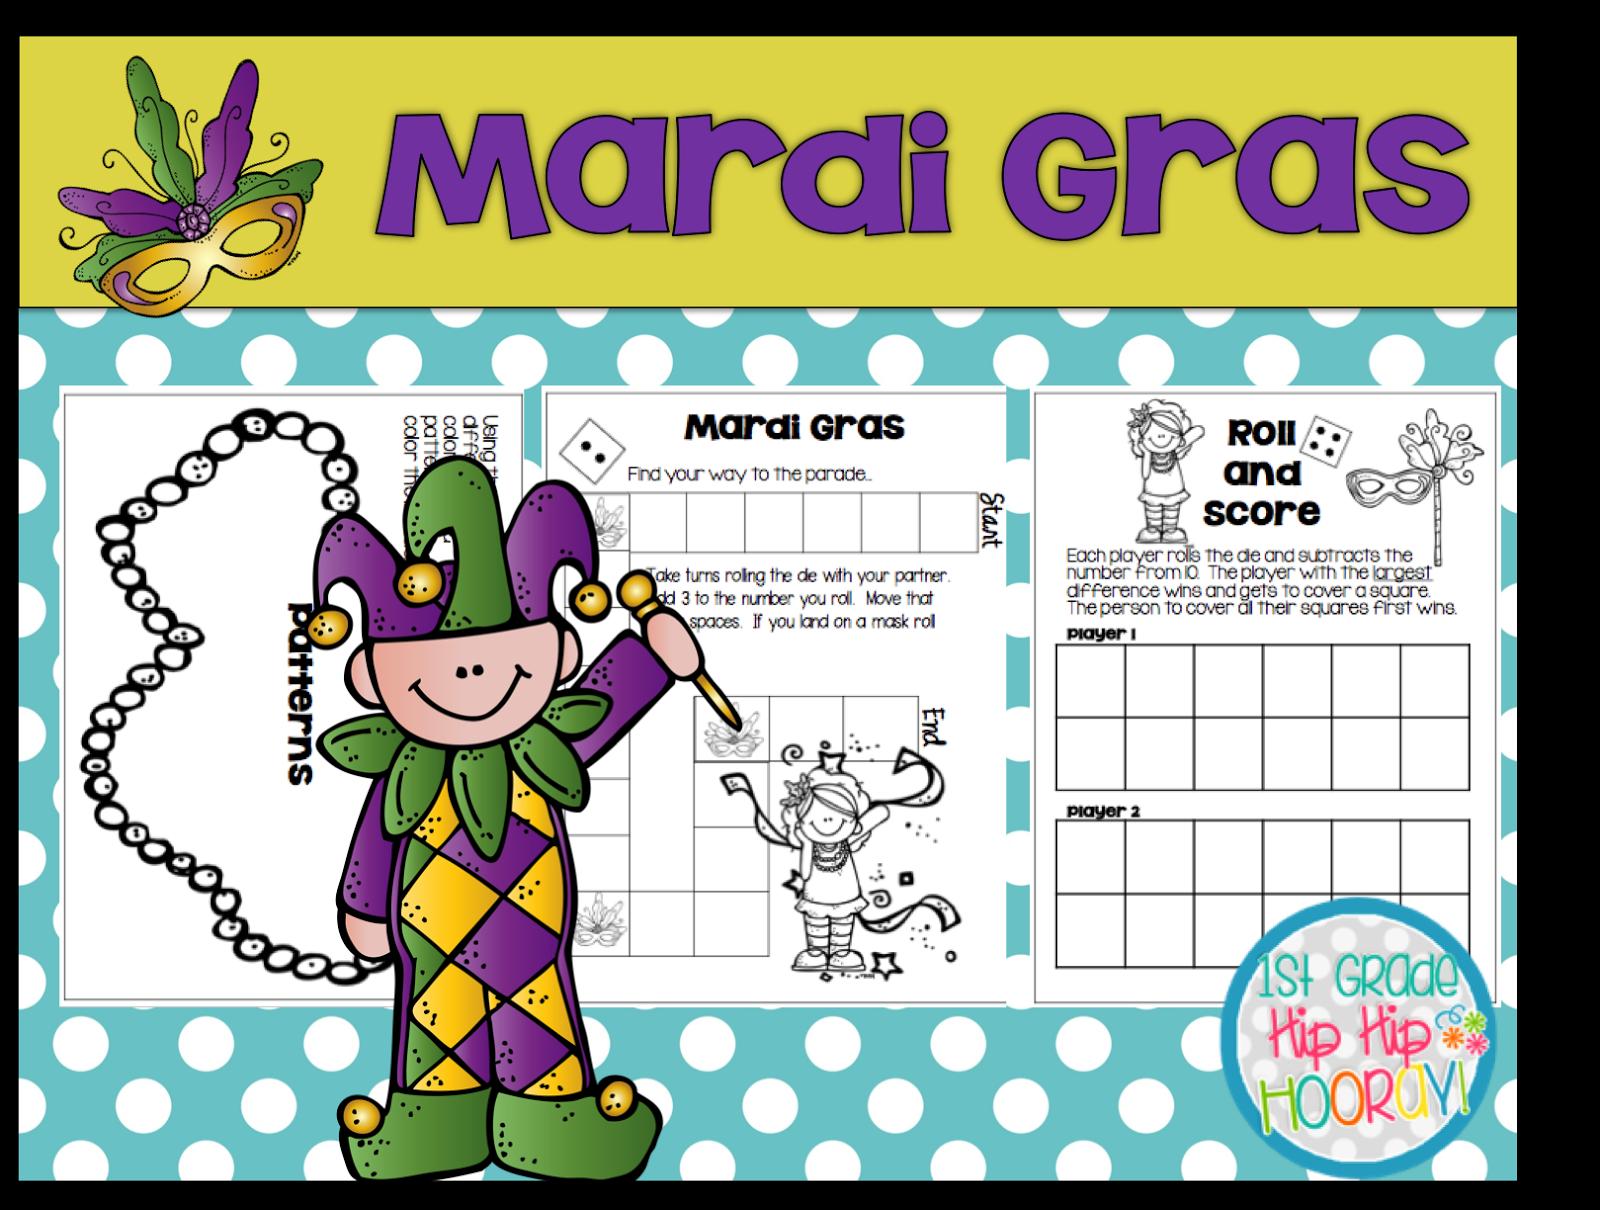 1st Grade Hip Hip Hooray Mardi Gras February 28th